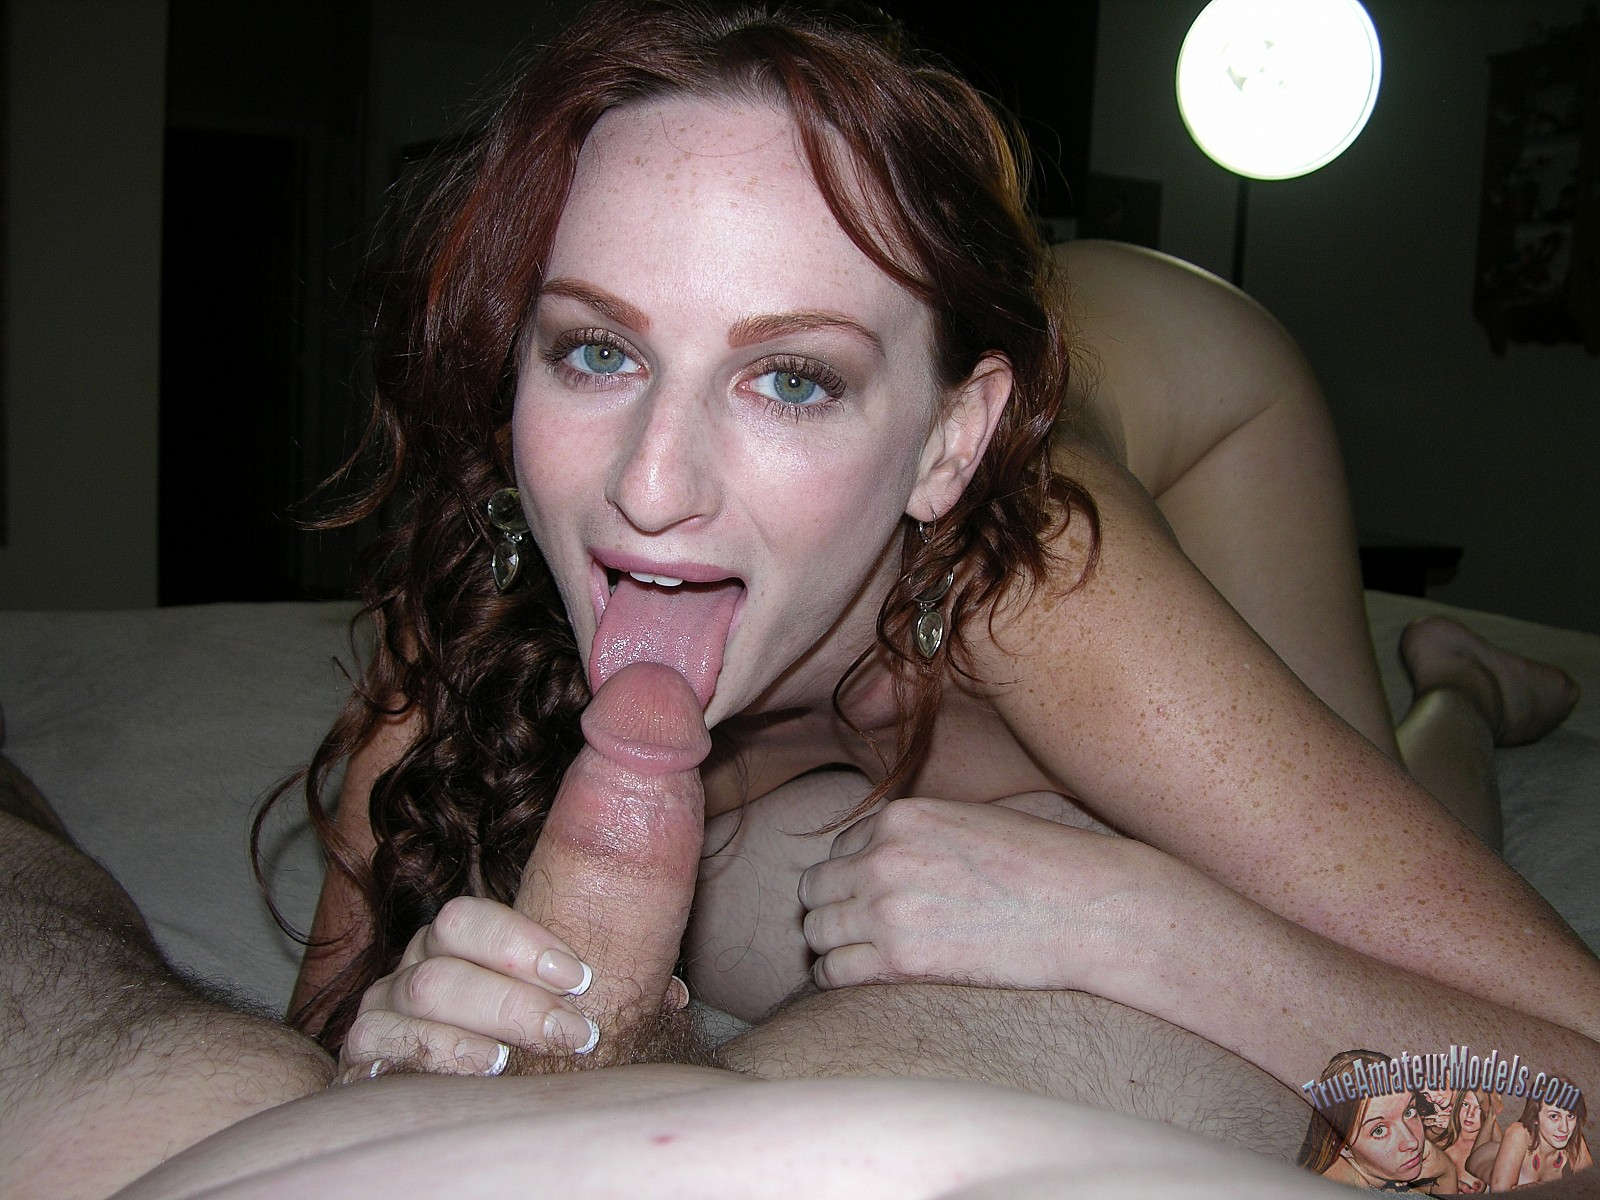 Hot Amateur Redhead Blowjob